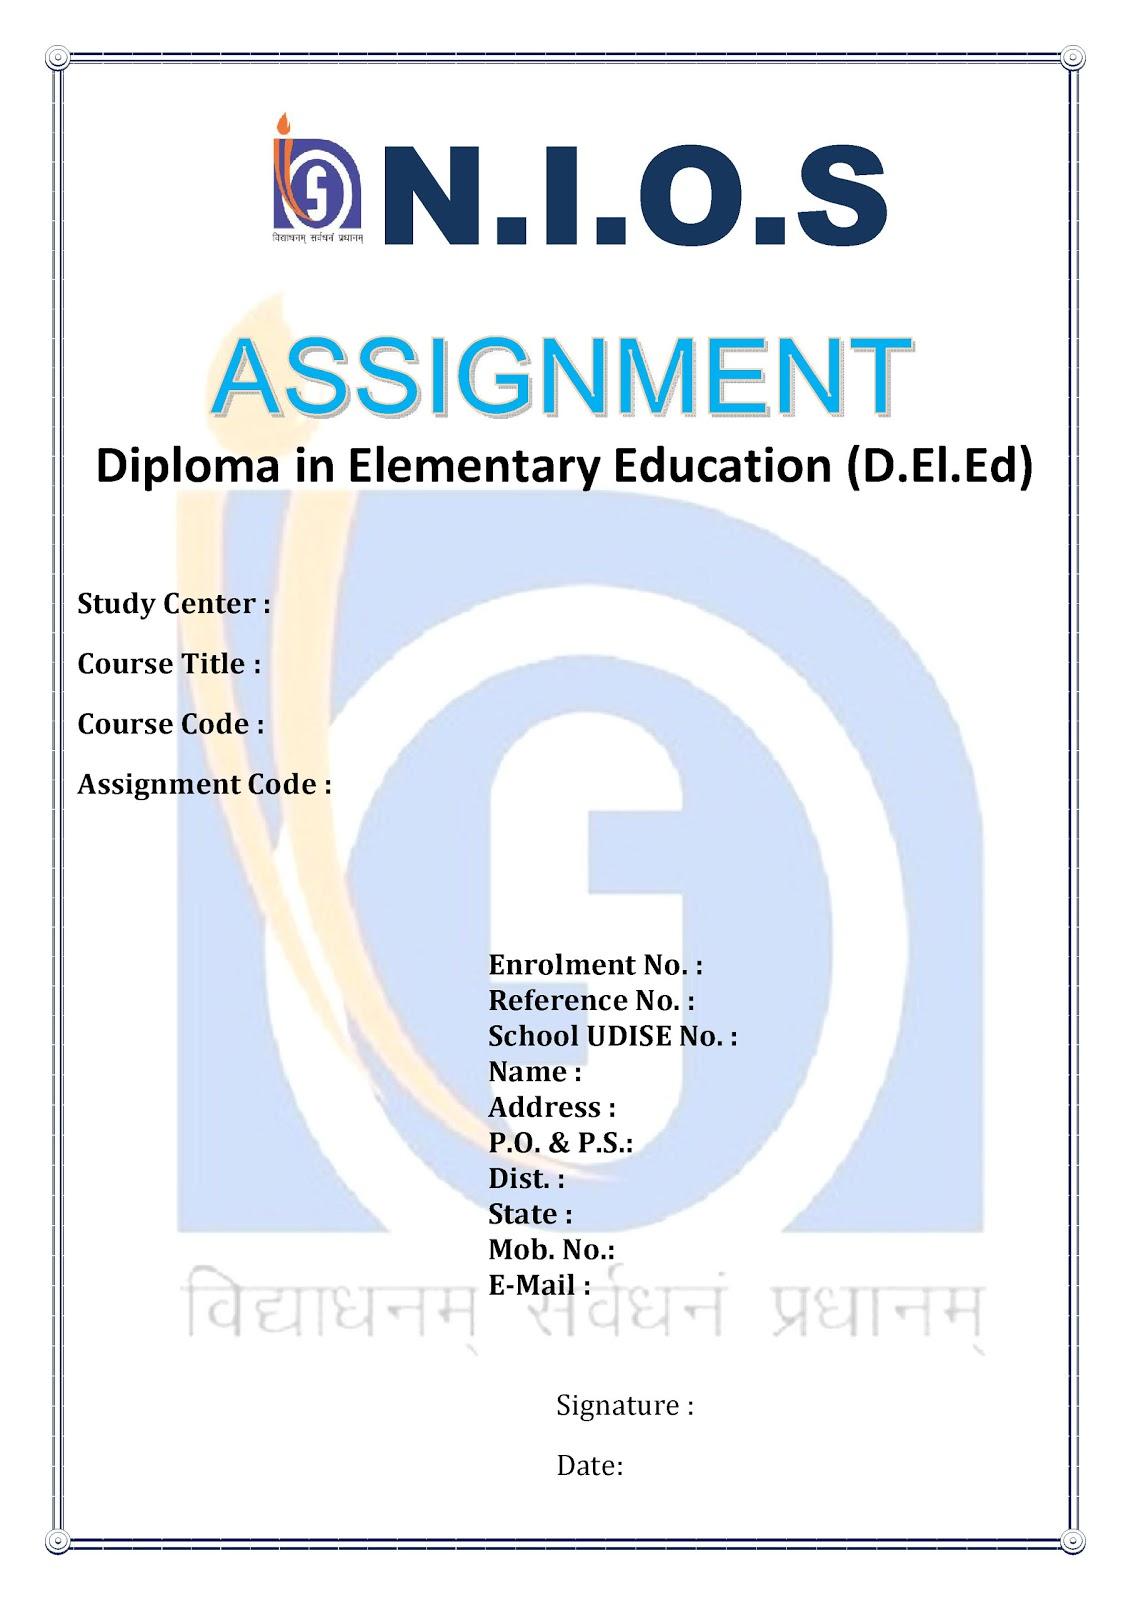 Nios assignment